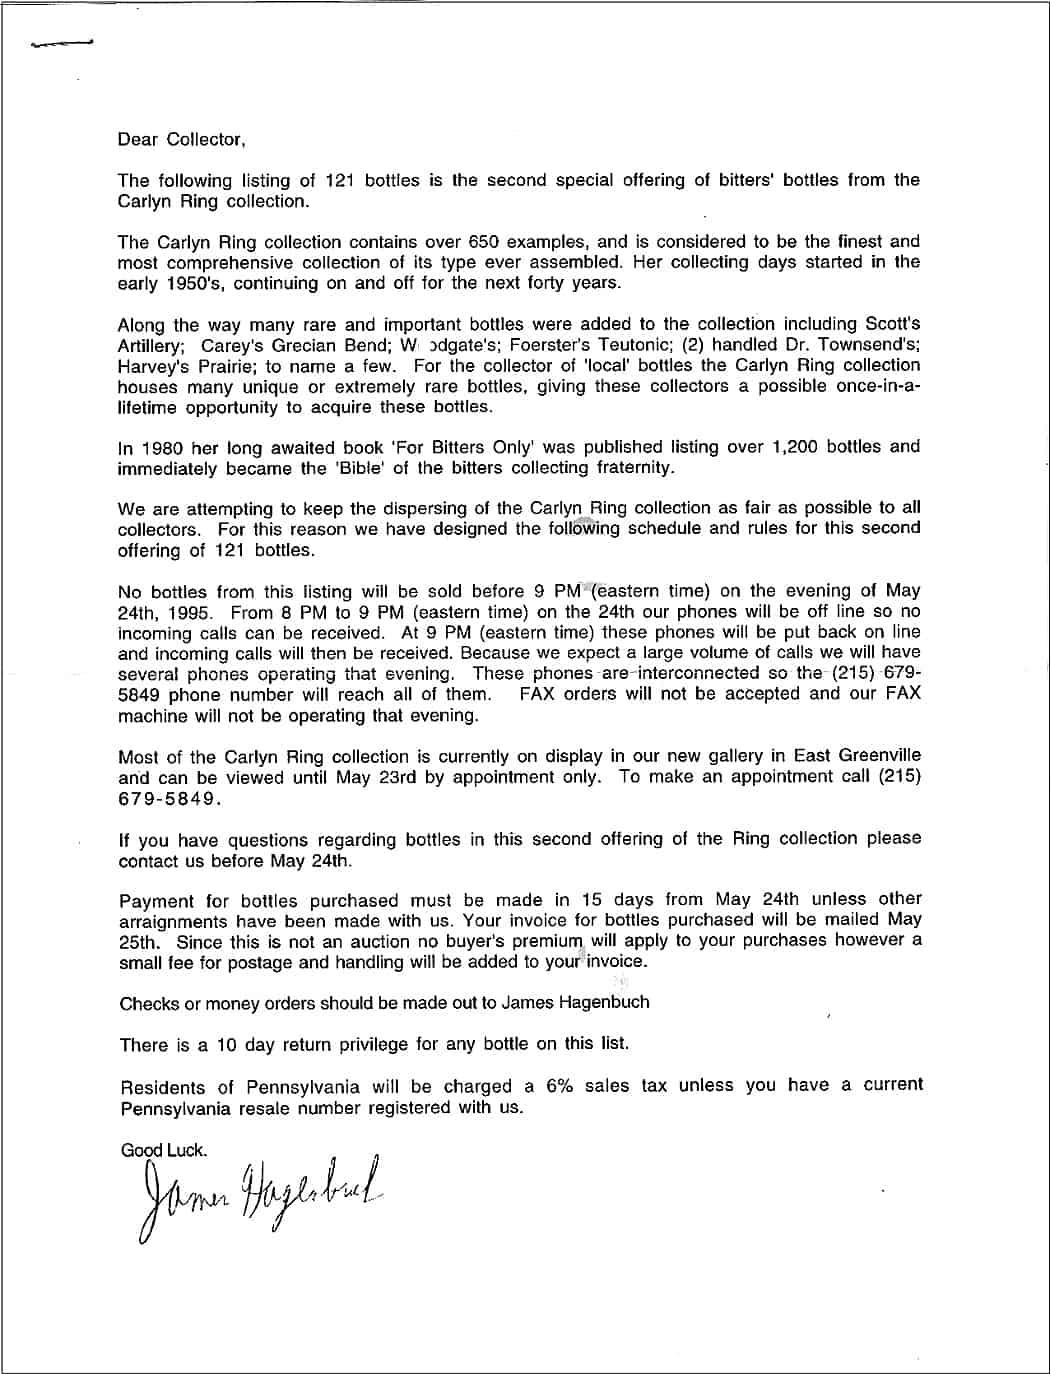 Carolyn Ring - Letter 2